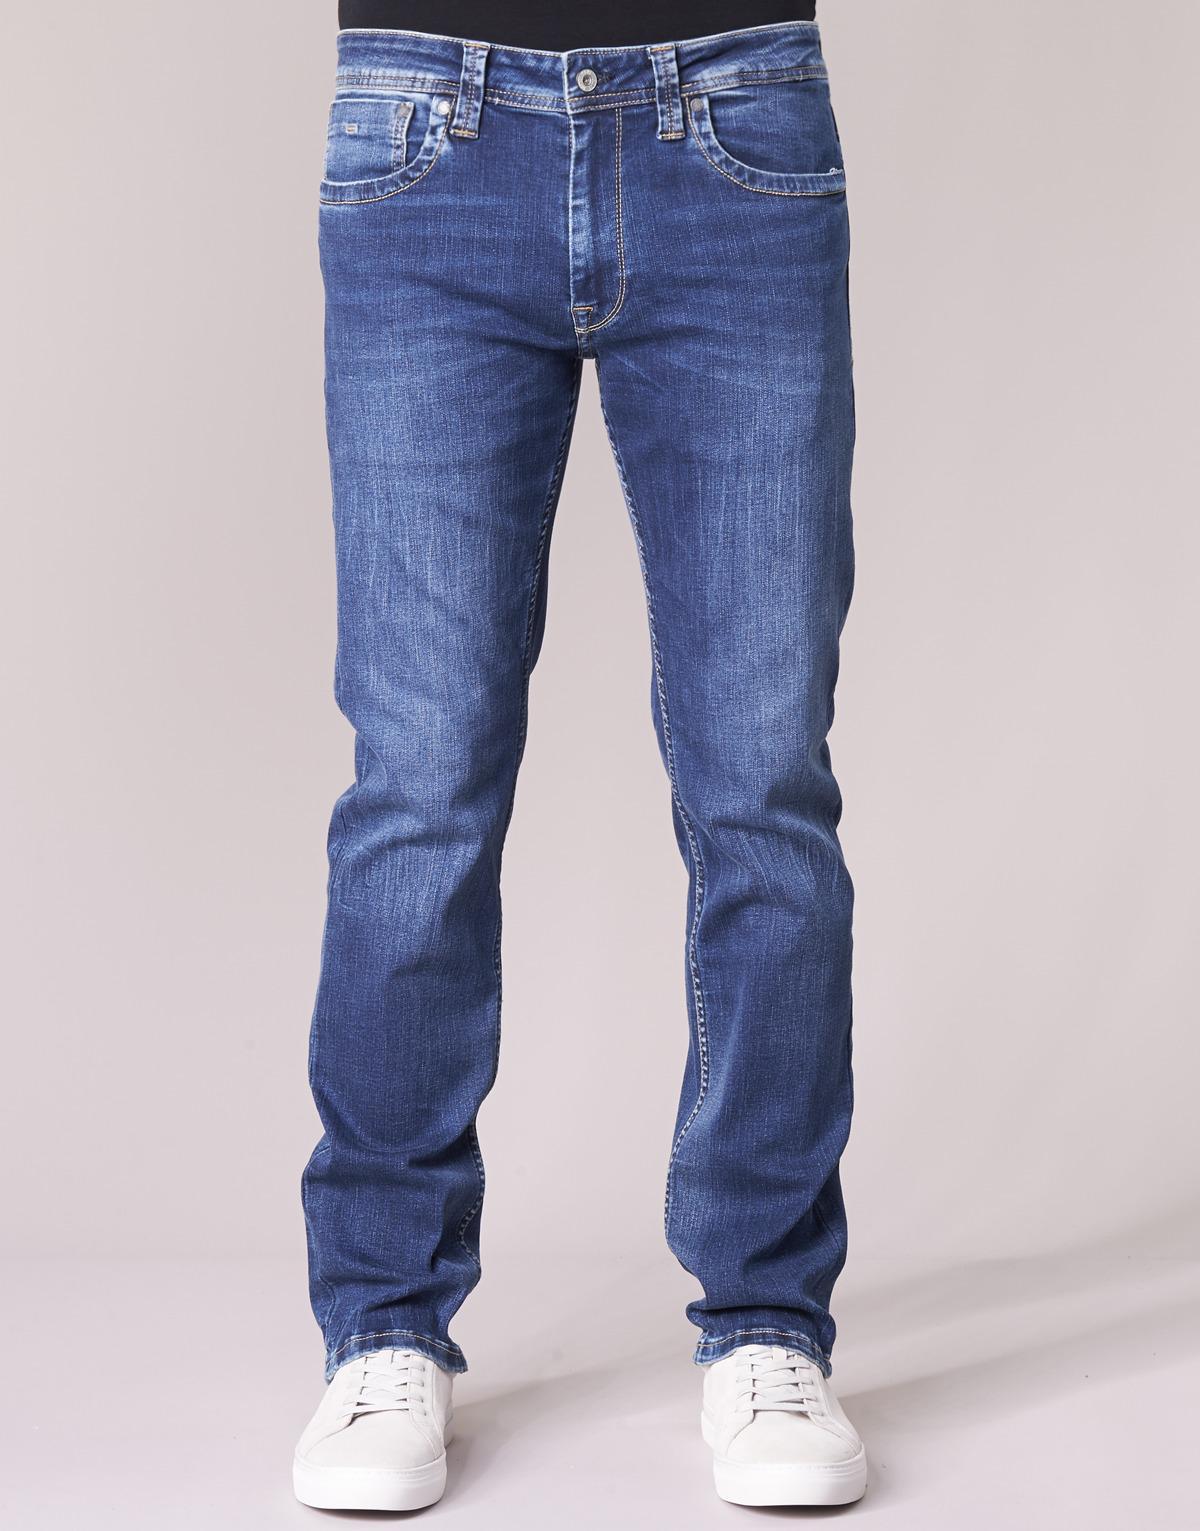 Pepe Jeans Denim Cash Men's Jeans In Blue for Men